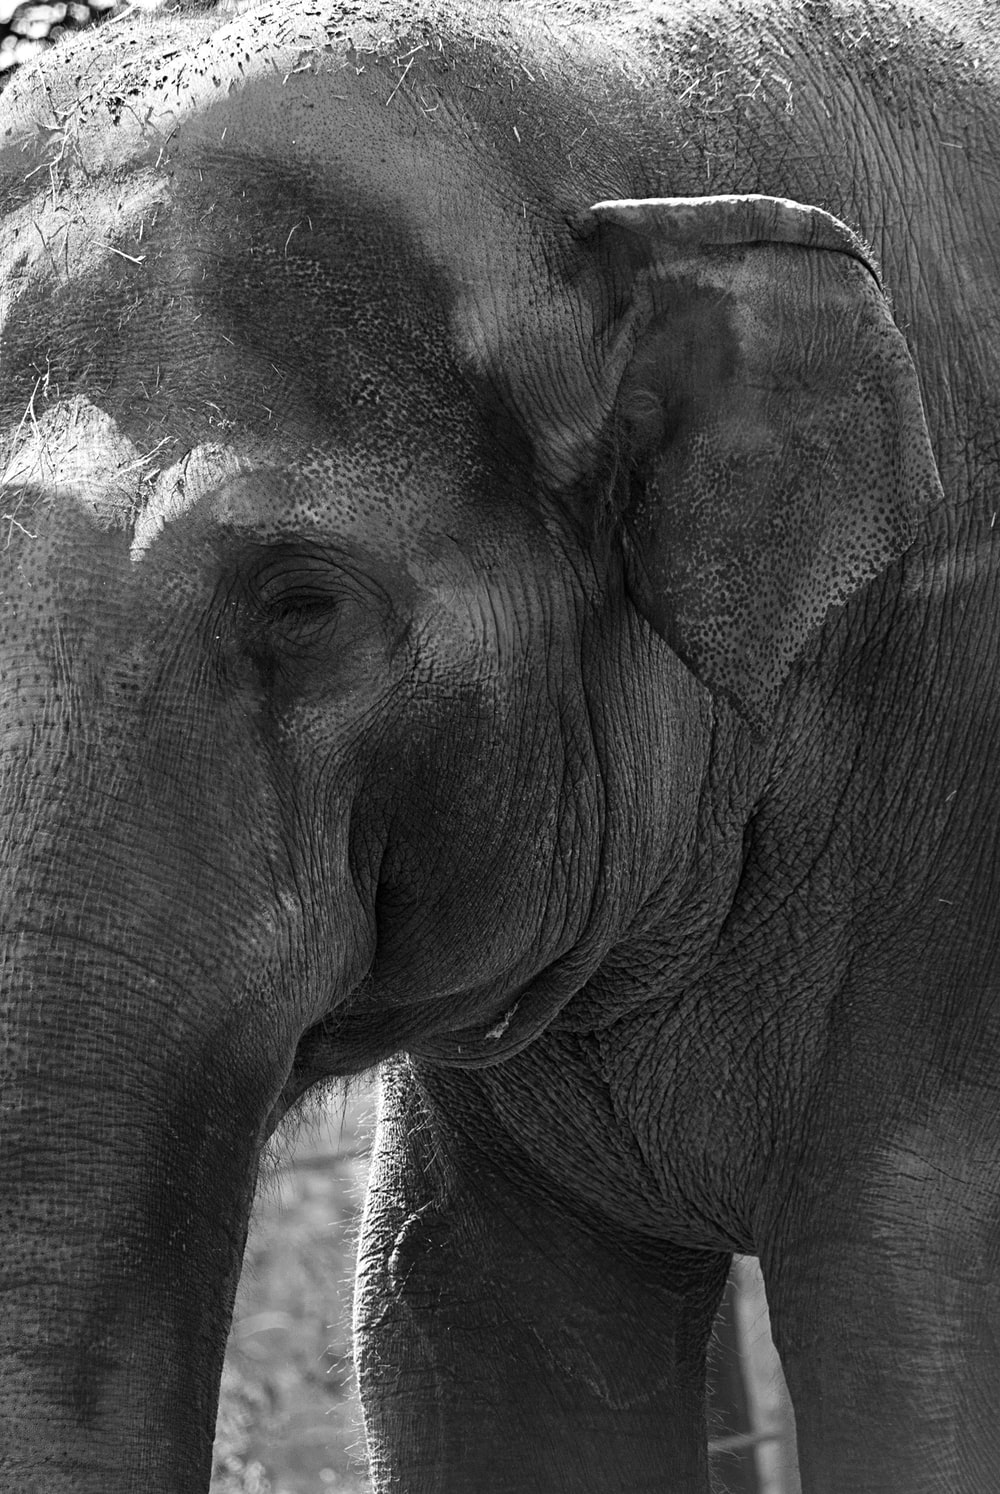 closeup photo of elephant